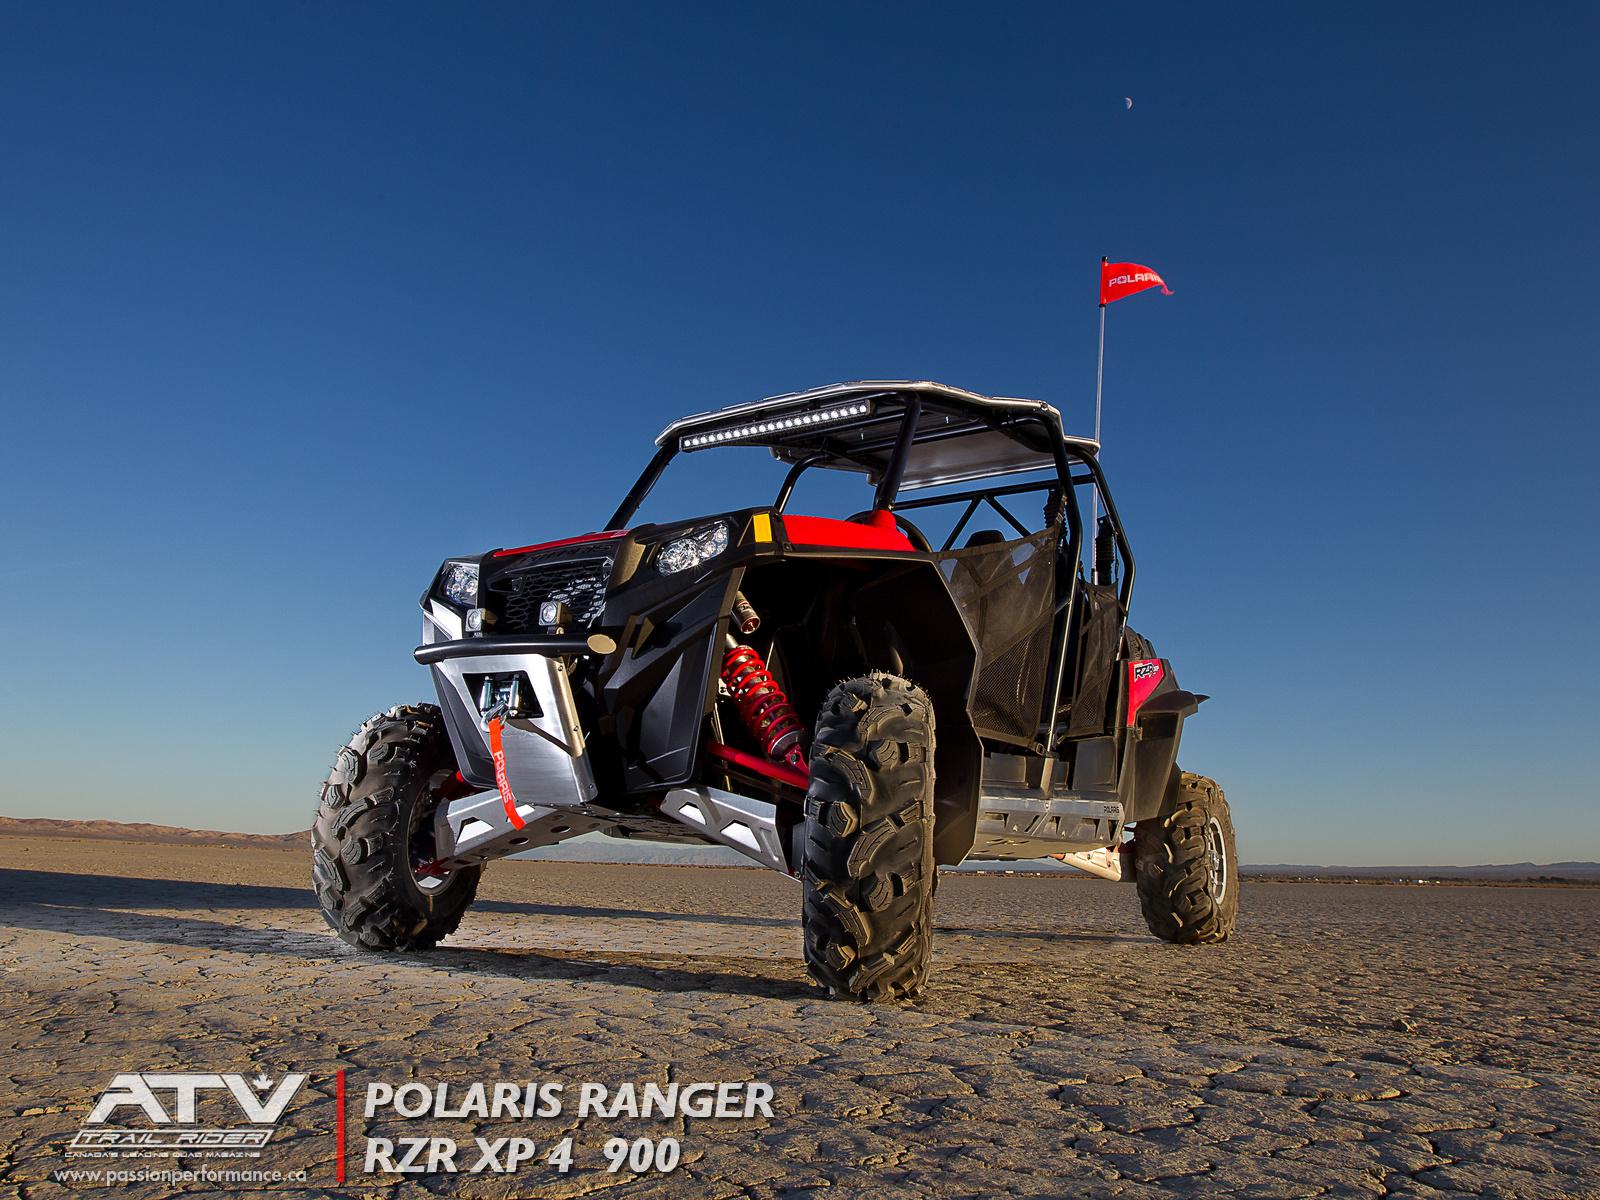 Wallpapers     ATV Trail Rider 1600x1200